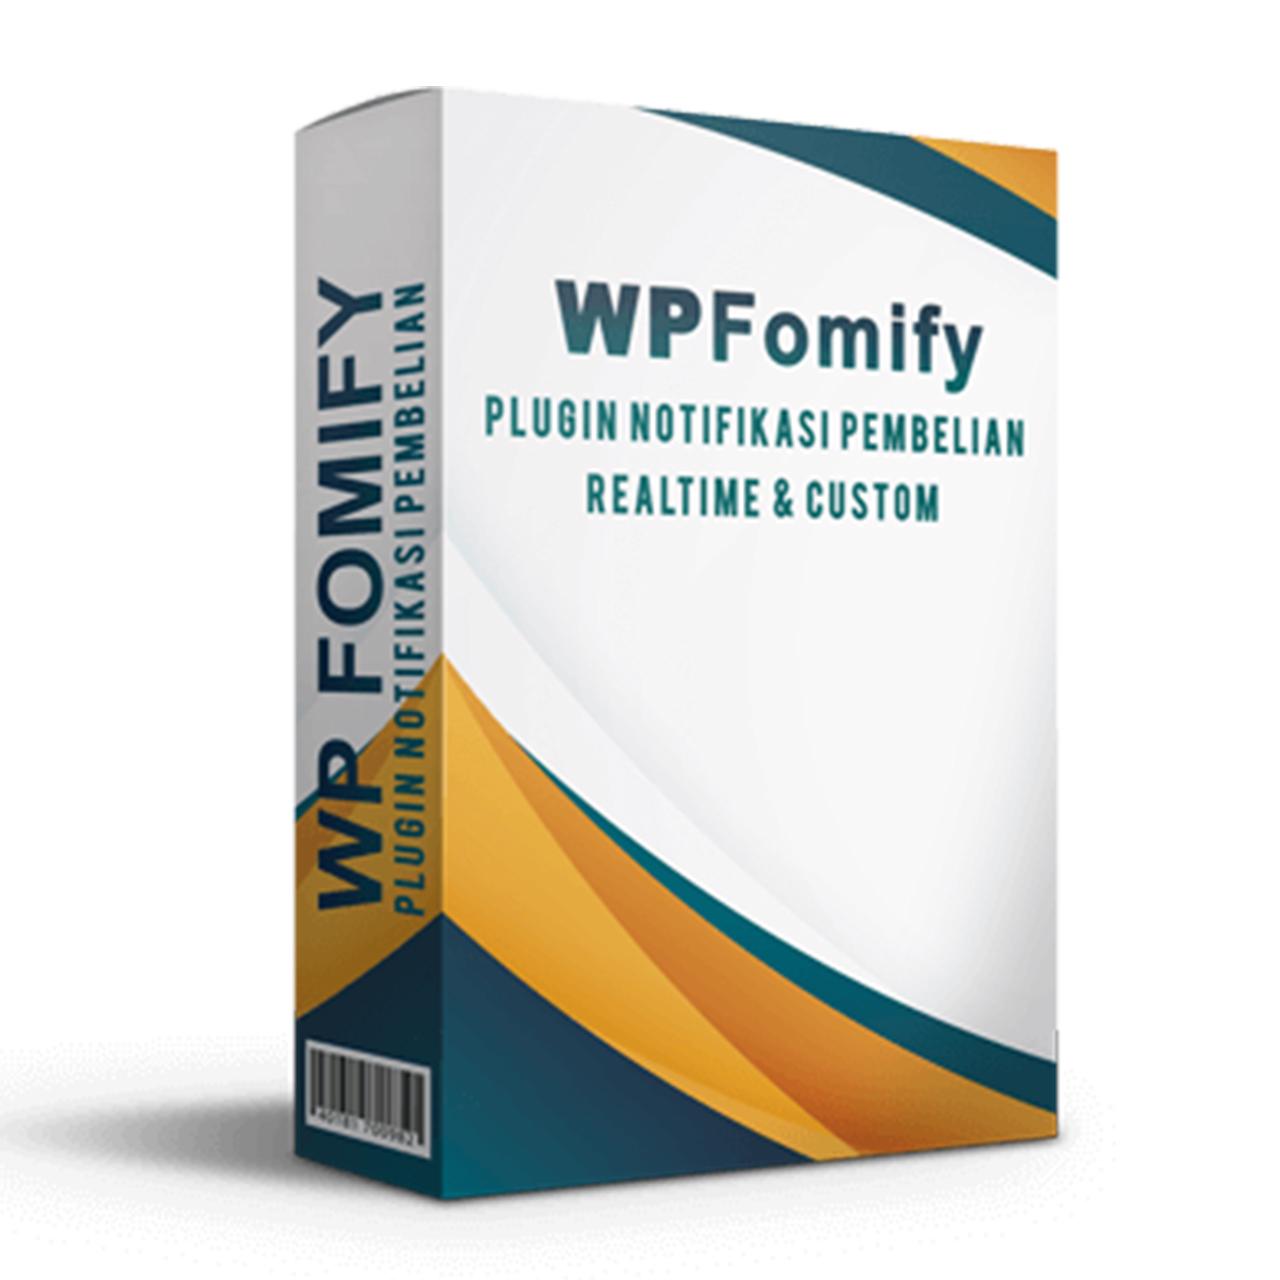 WP FOMIFY Plugin Notifikasi Pembelian